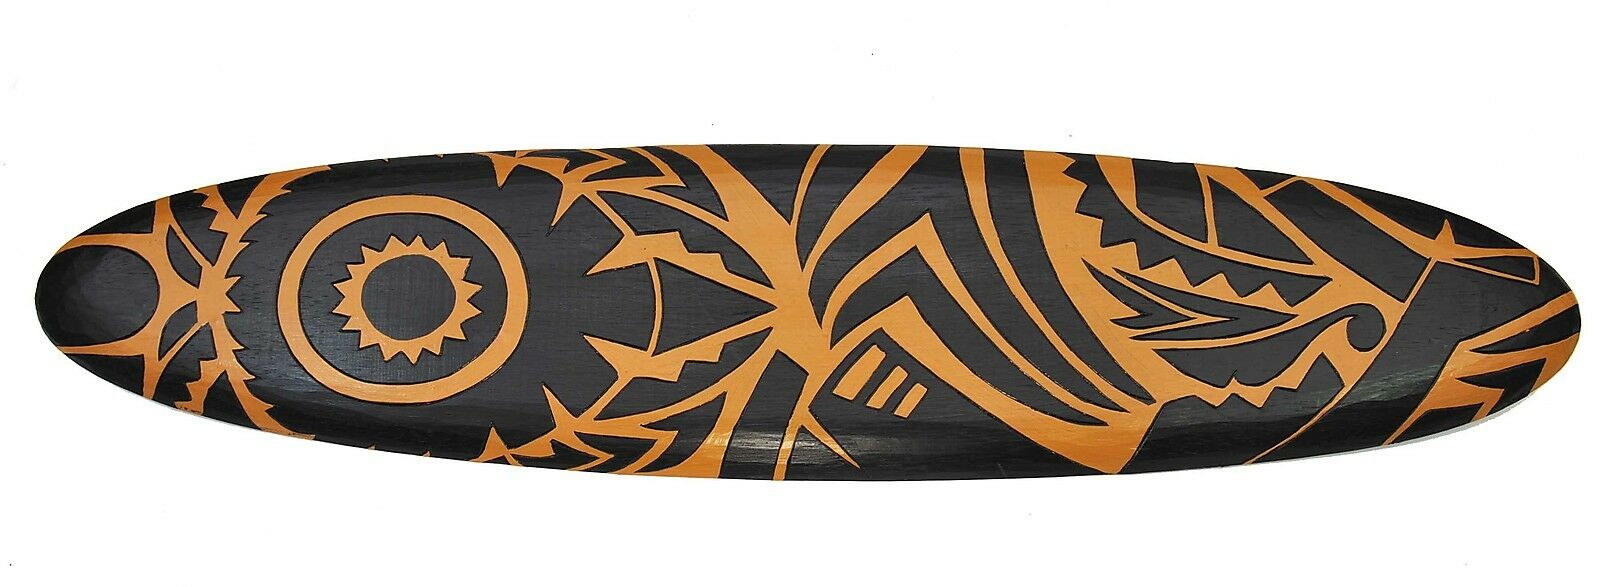 Surfbrett 100cm Moai Maori Tribal Wanddekoration für Surfer